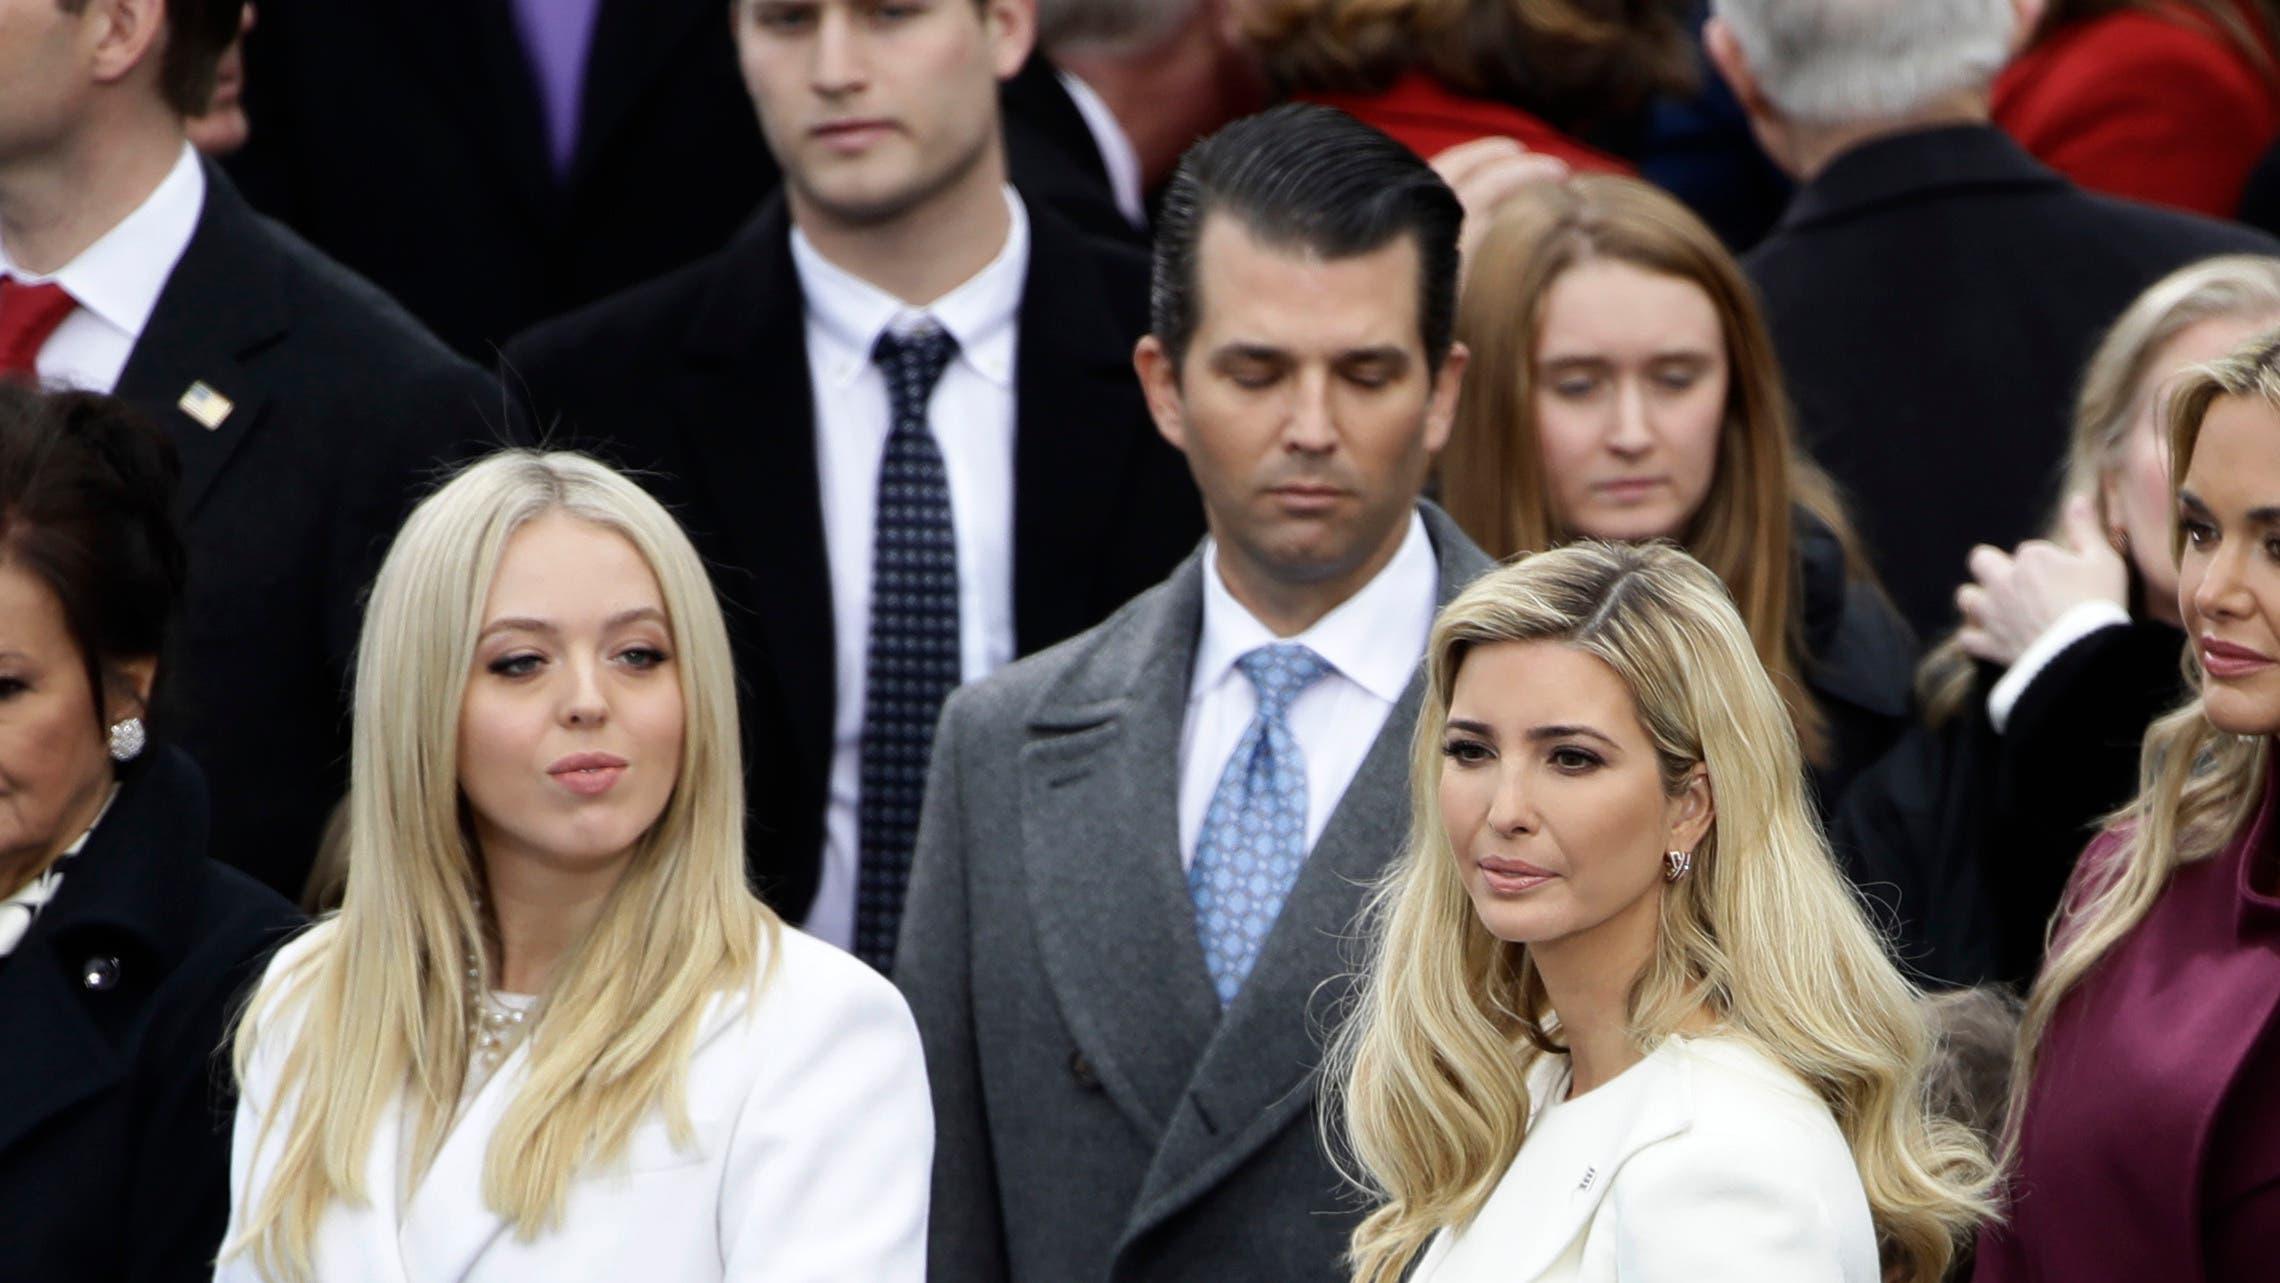 Trumps Kinder bei der Amtseinführung: (v.l.) Tiffany, Donald Trump Jr. und Ivanka Trump.